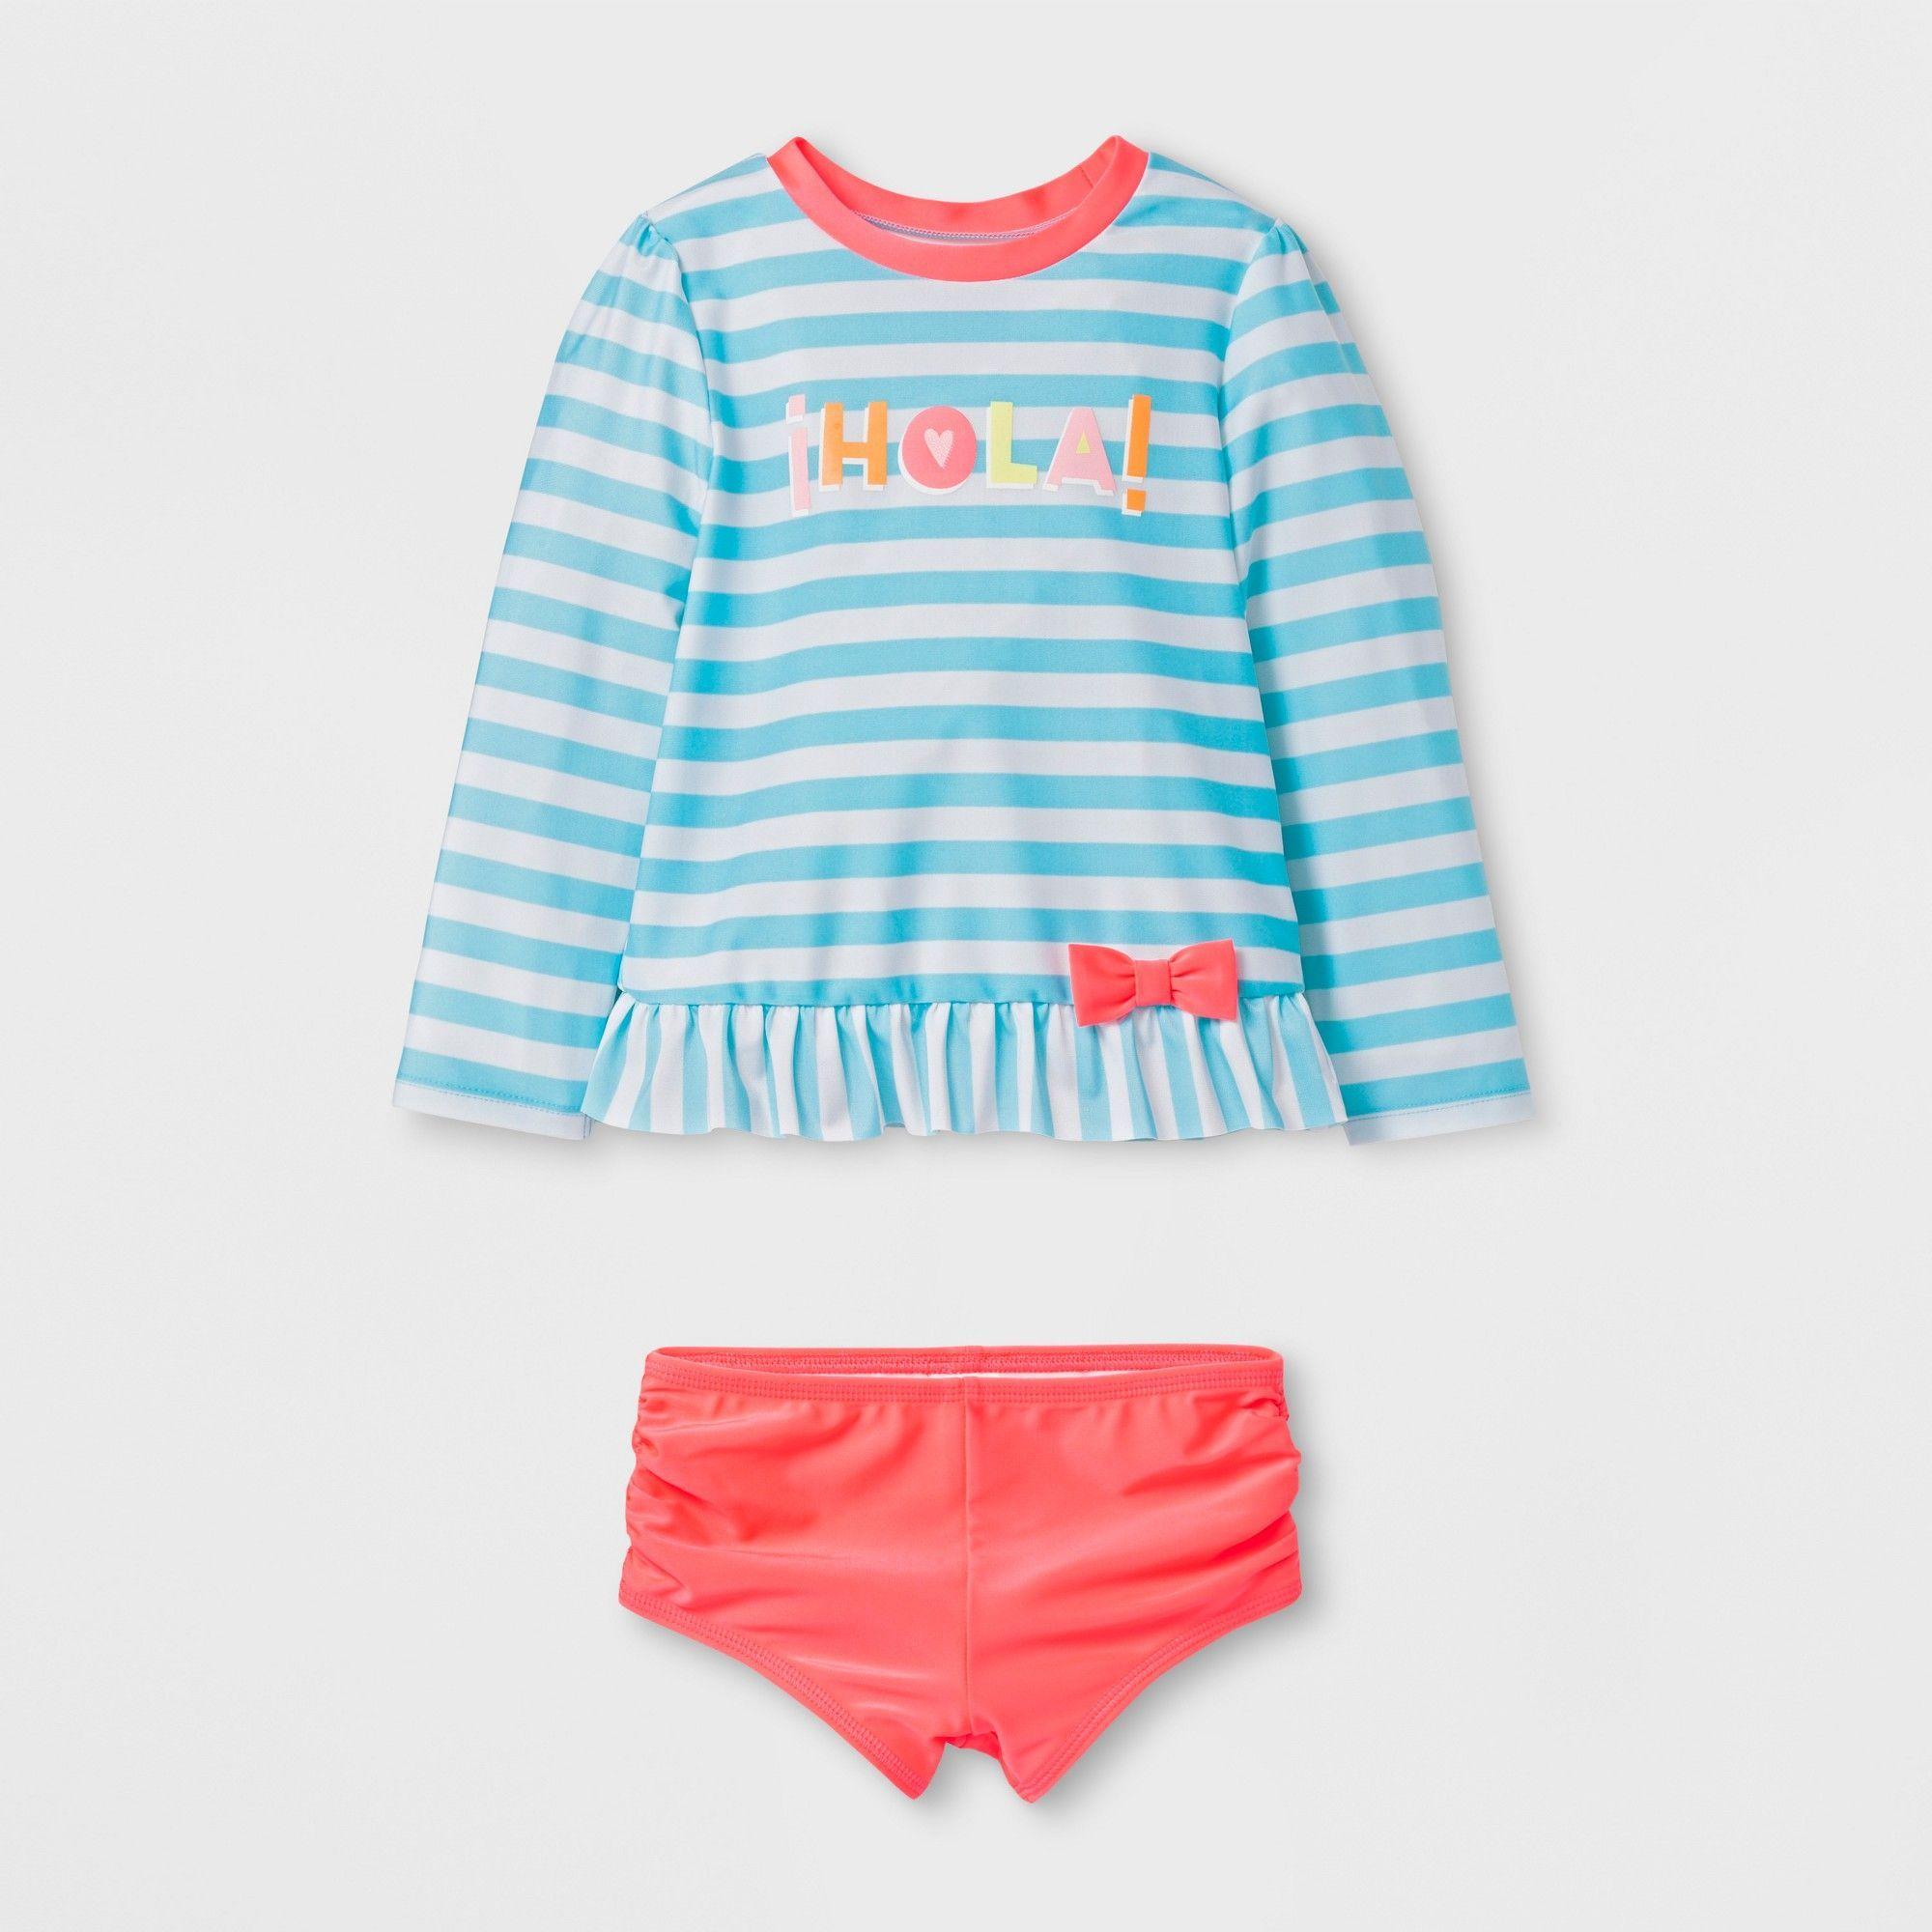 626780525c Toddler Girls' Hola! Rash Guard Set - Cat & Jack Aqua 6X, Blue ...